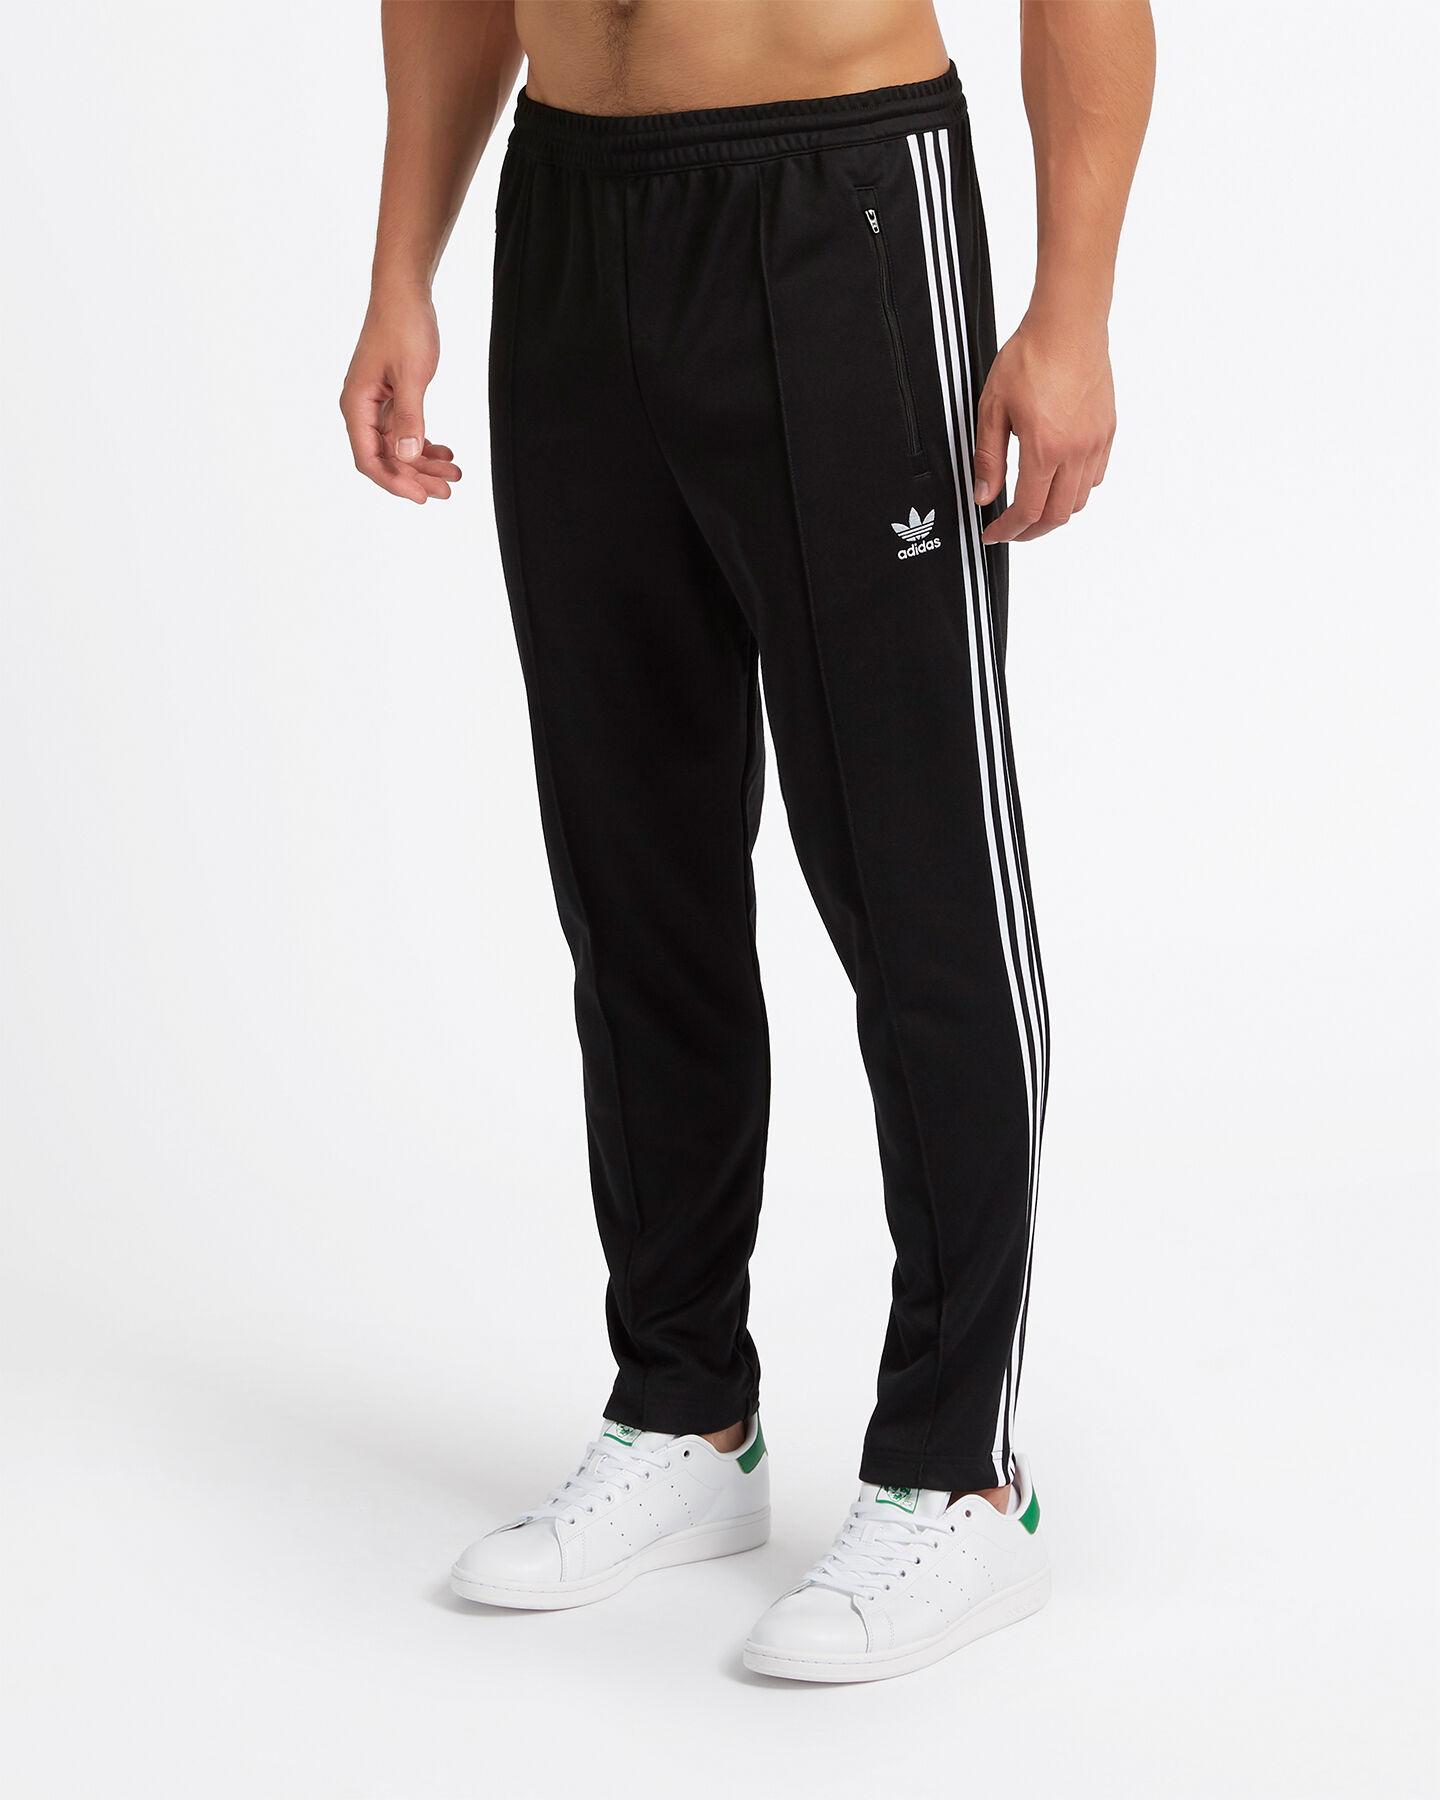 Pantalone ADIDAS FRANZ BECKENBAUER  M S4033219 scatto 2